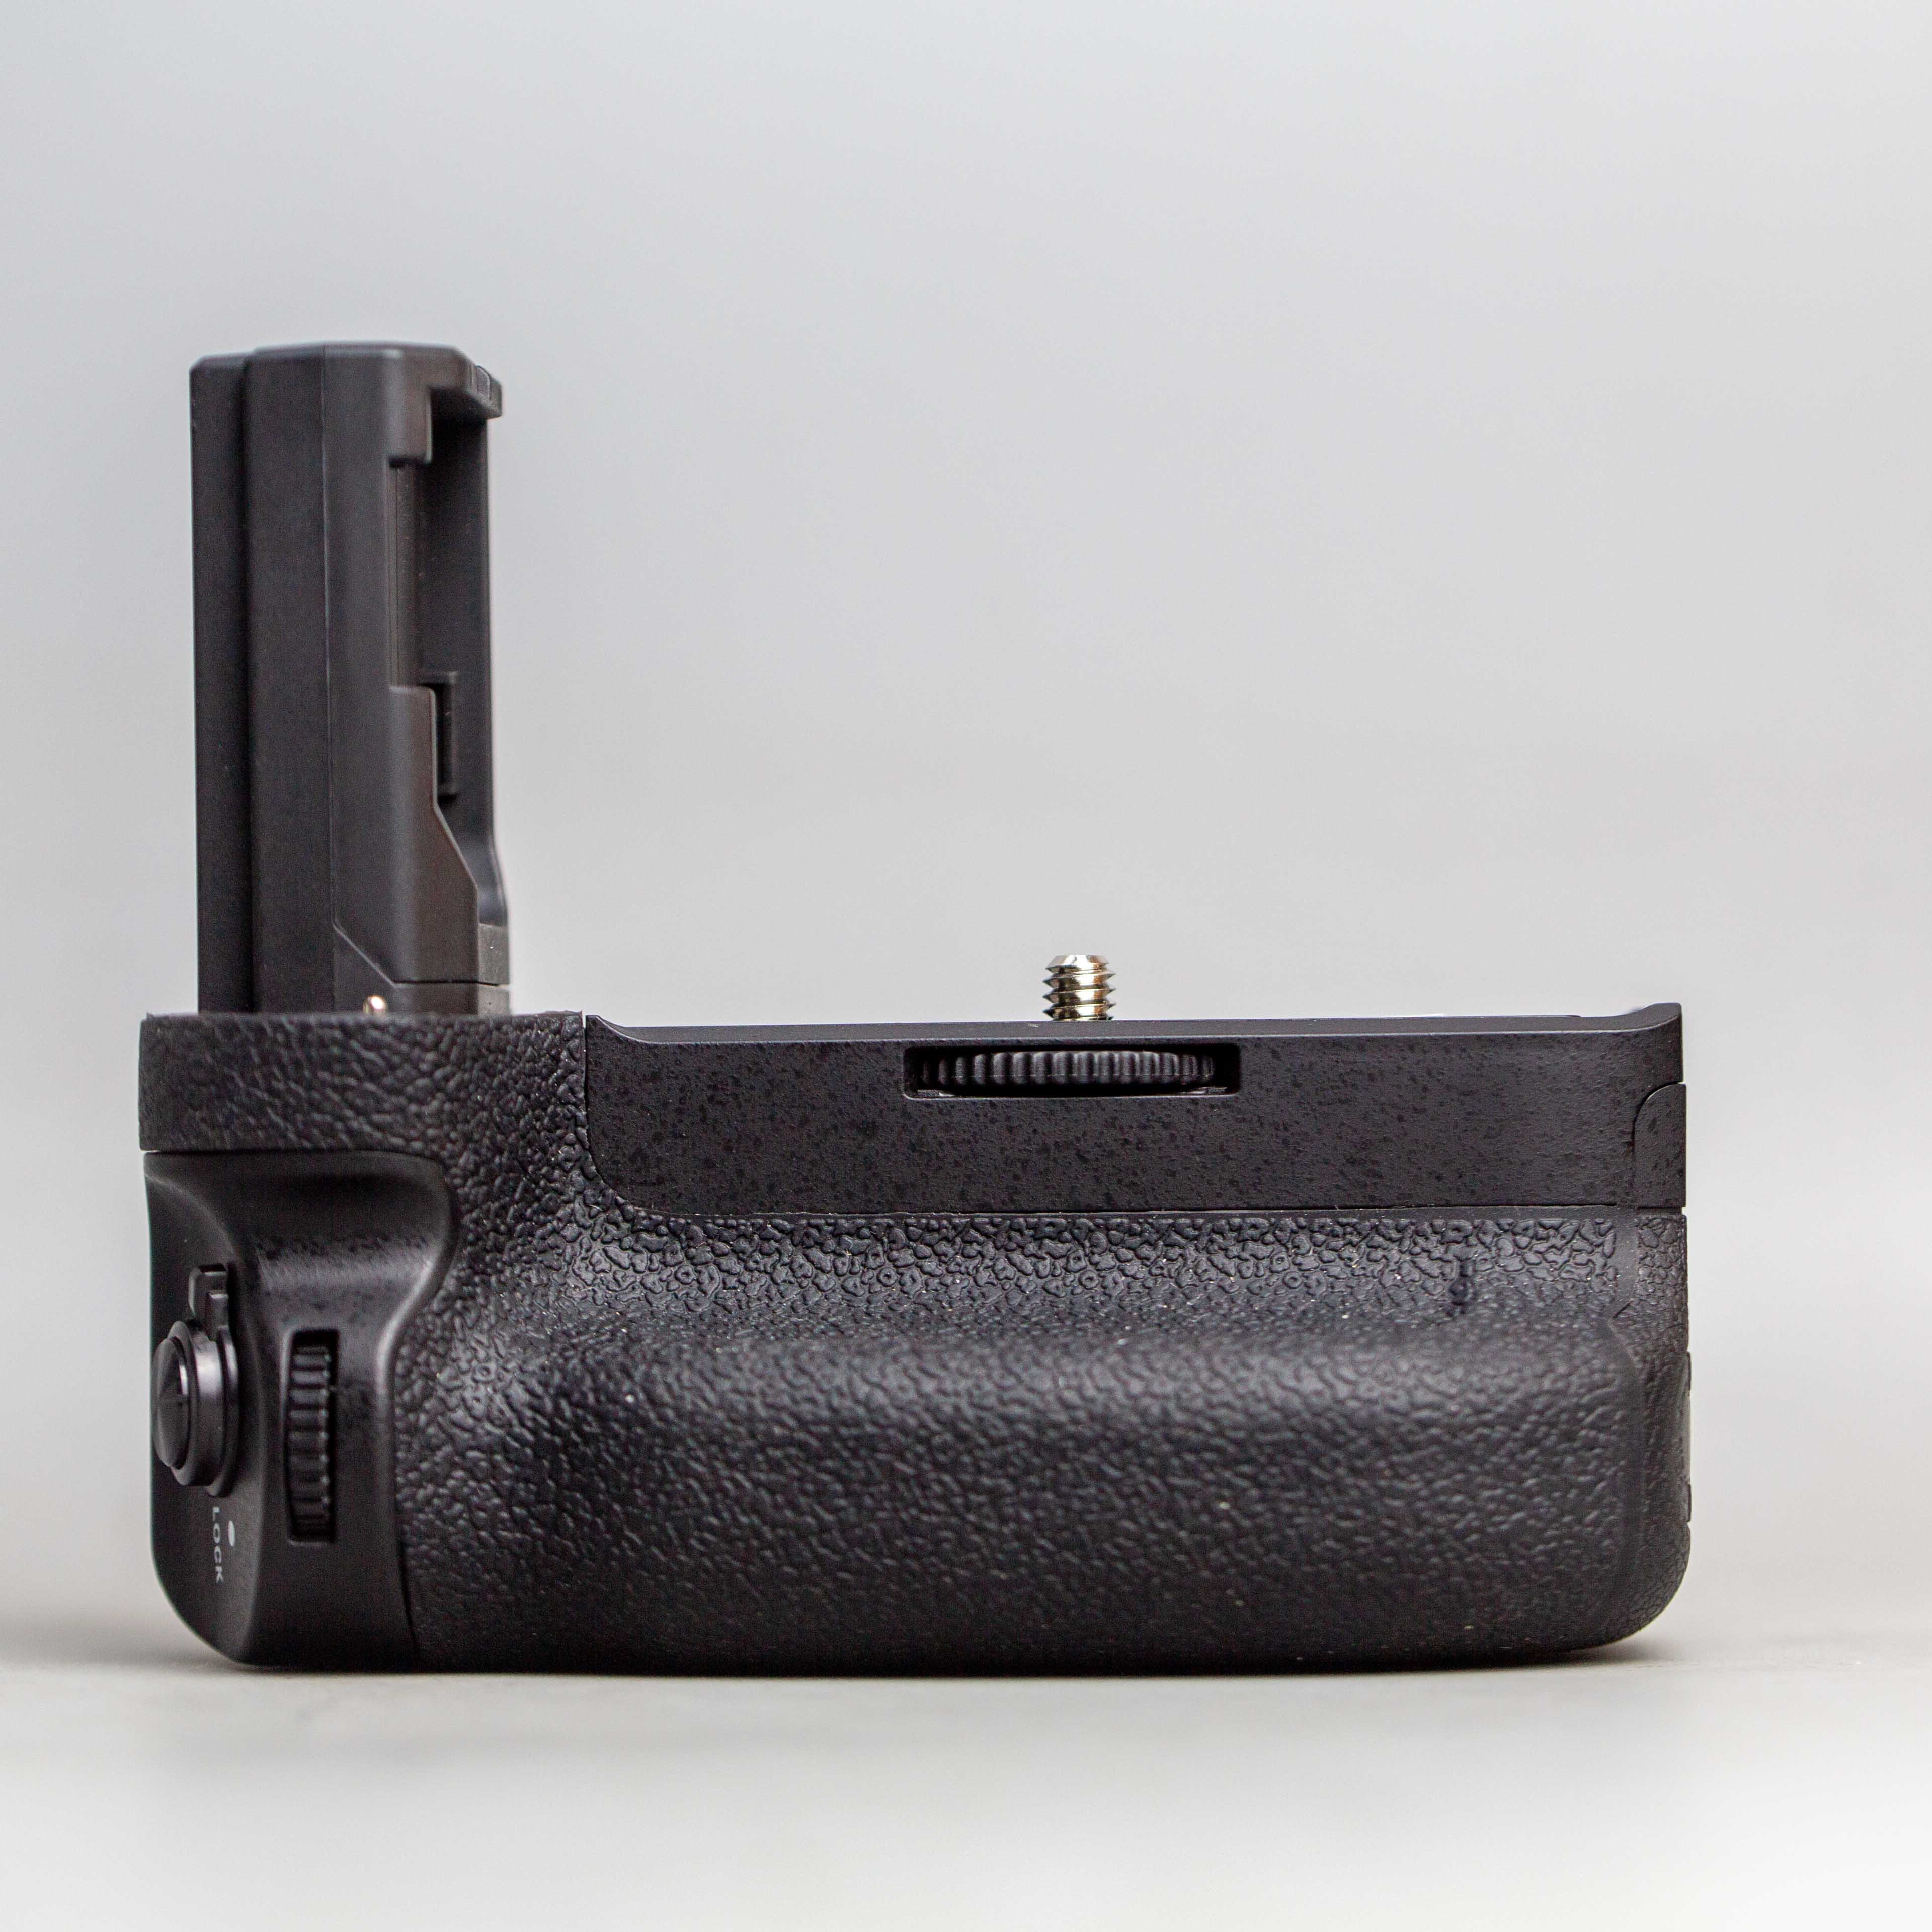 neewer-for-sony-a9-a7iii-a7riii-battery-grip-14724